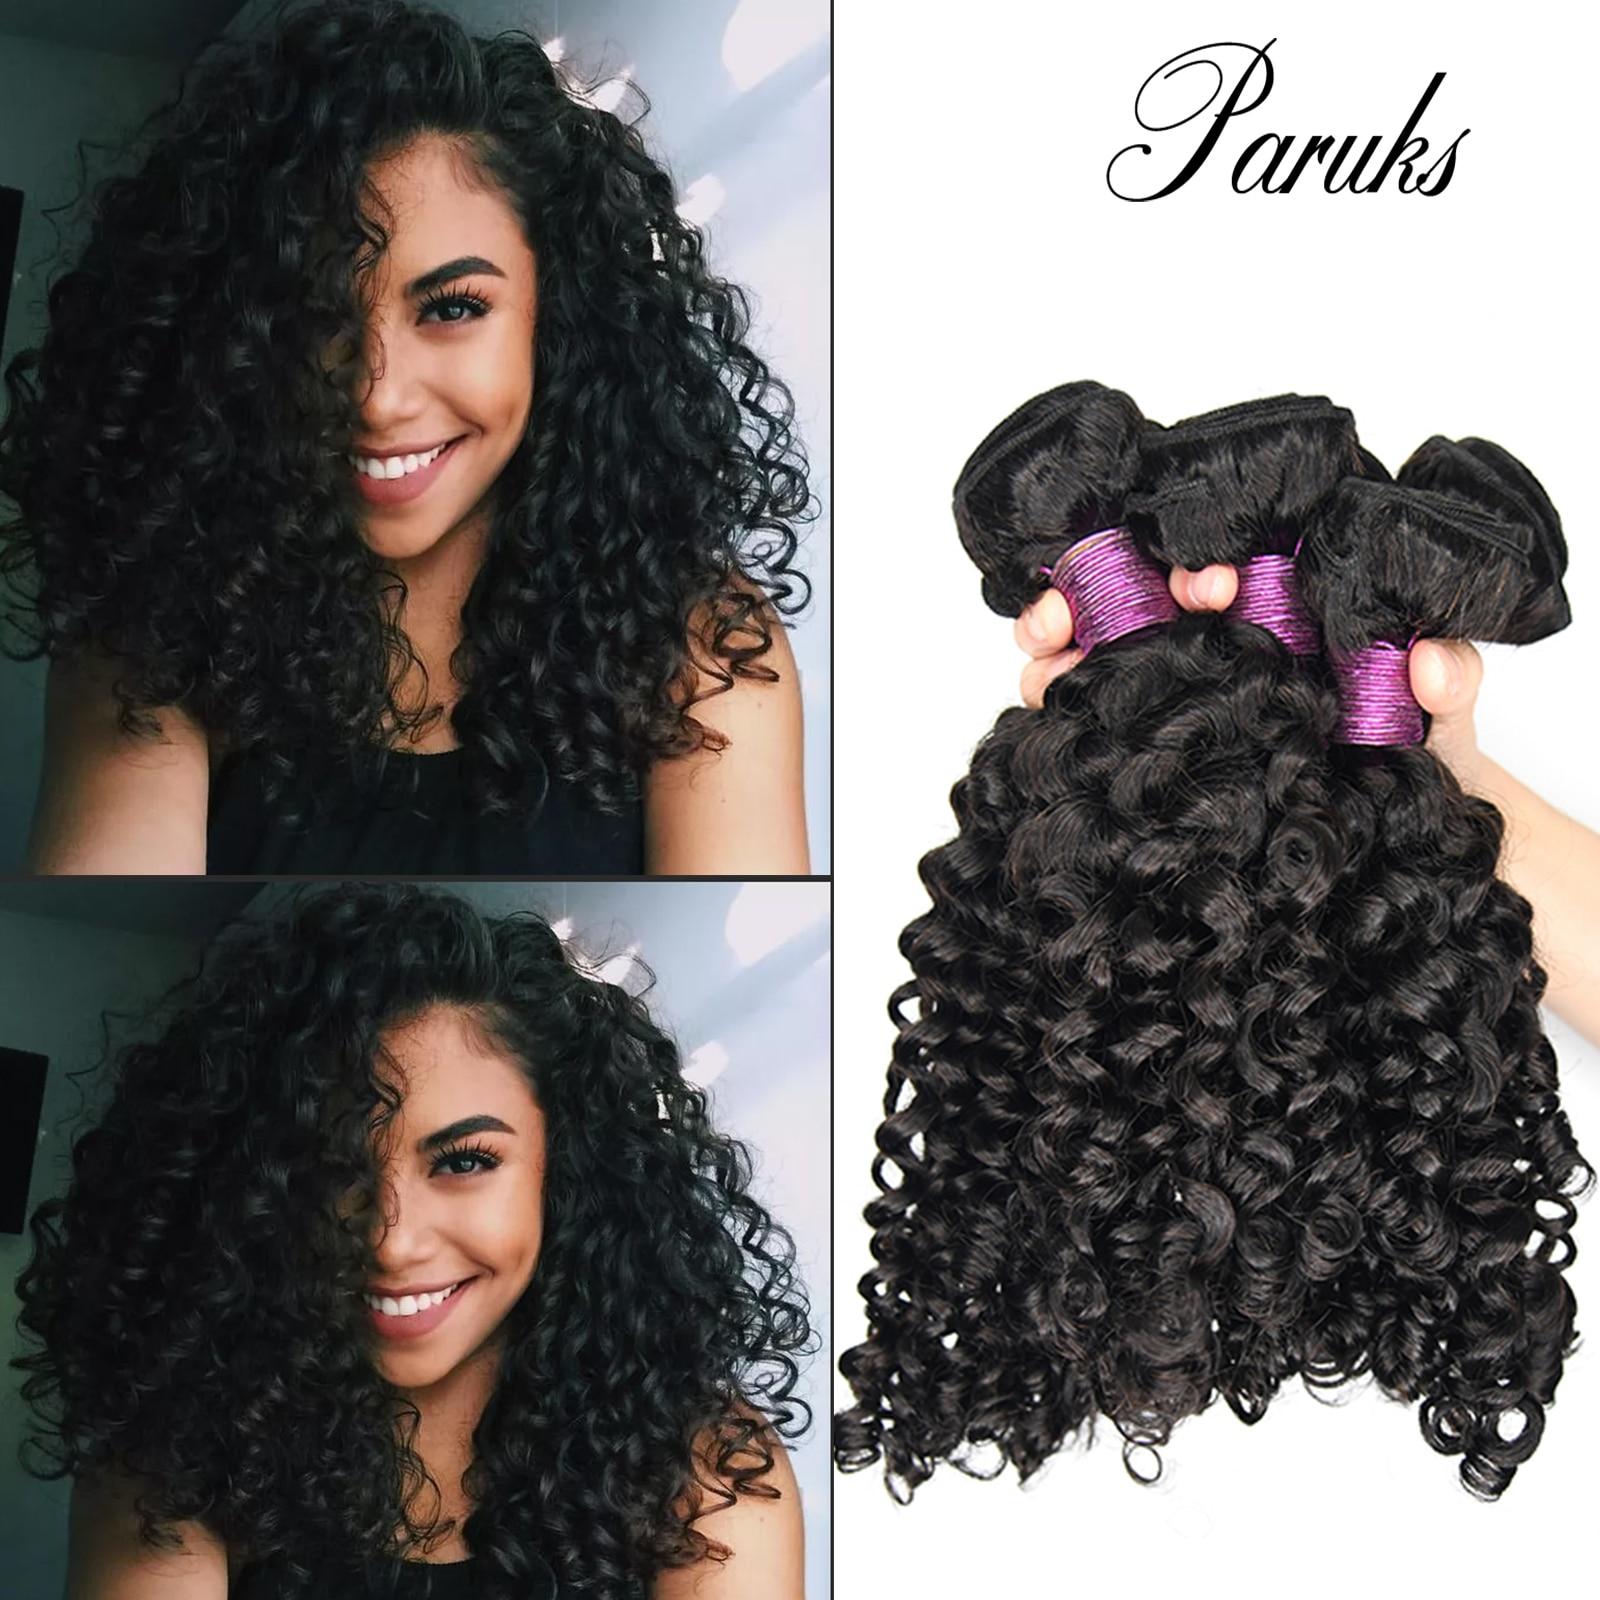 Paruks Italian Wavy Hair Brazilian Virgin Hair Weave Bundles100%Unprocessed Human Remy HairExtensions Human Hair Bundles Weft